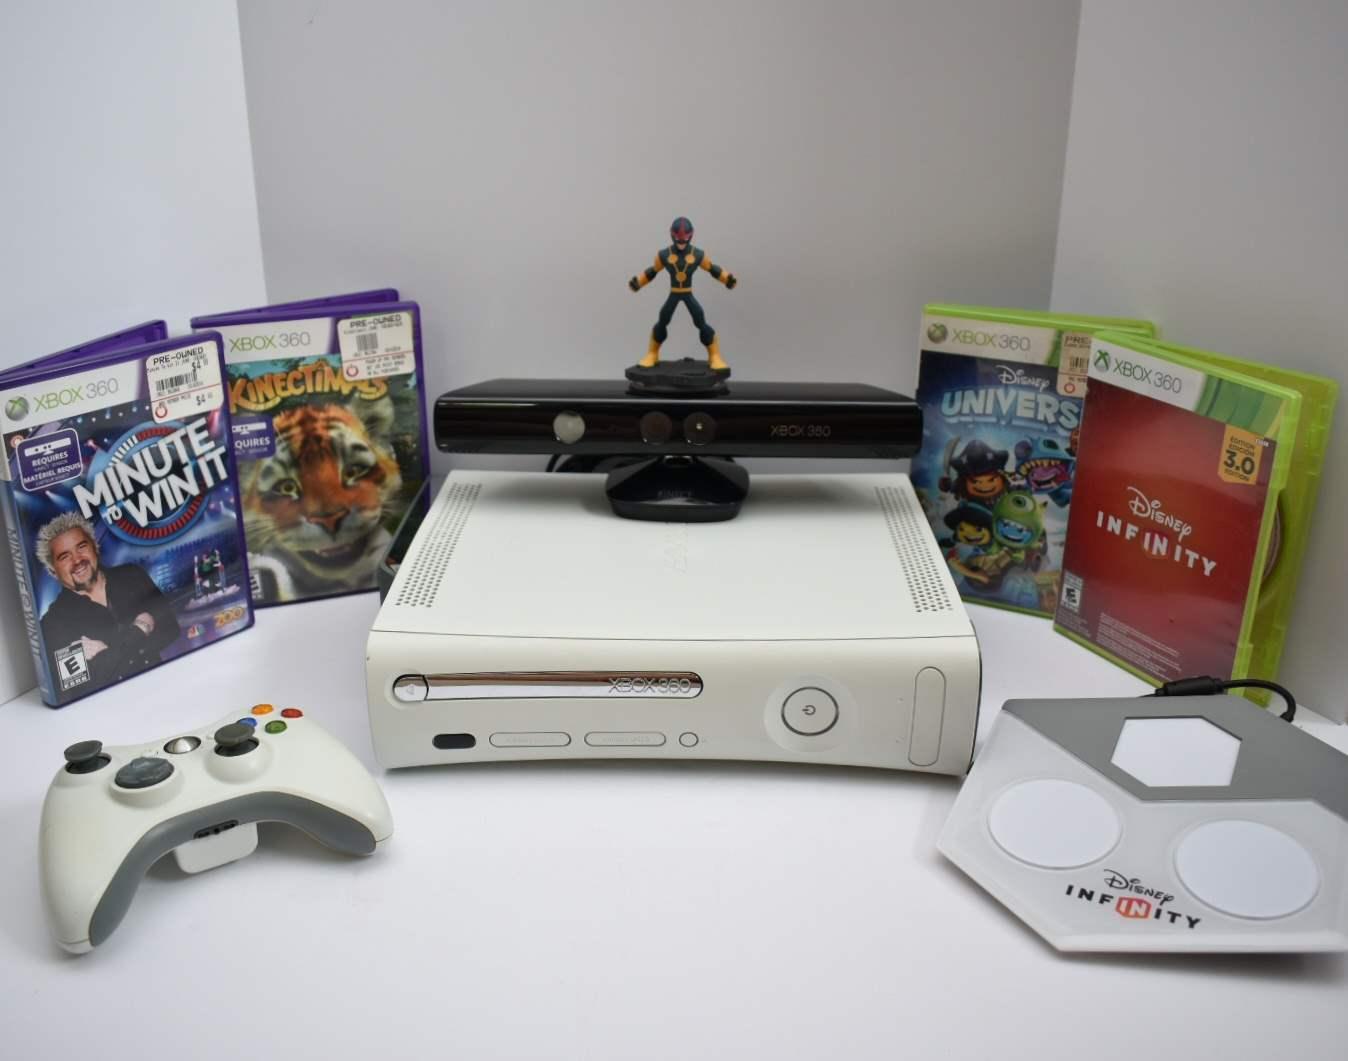 Xbox 360 Bundle with Kinect and Disney Infinity